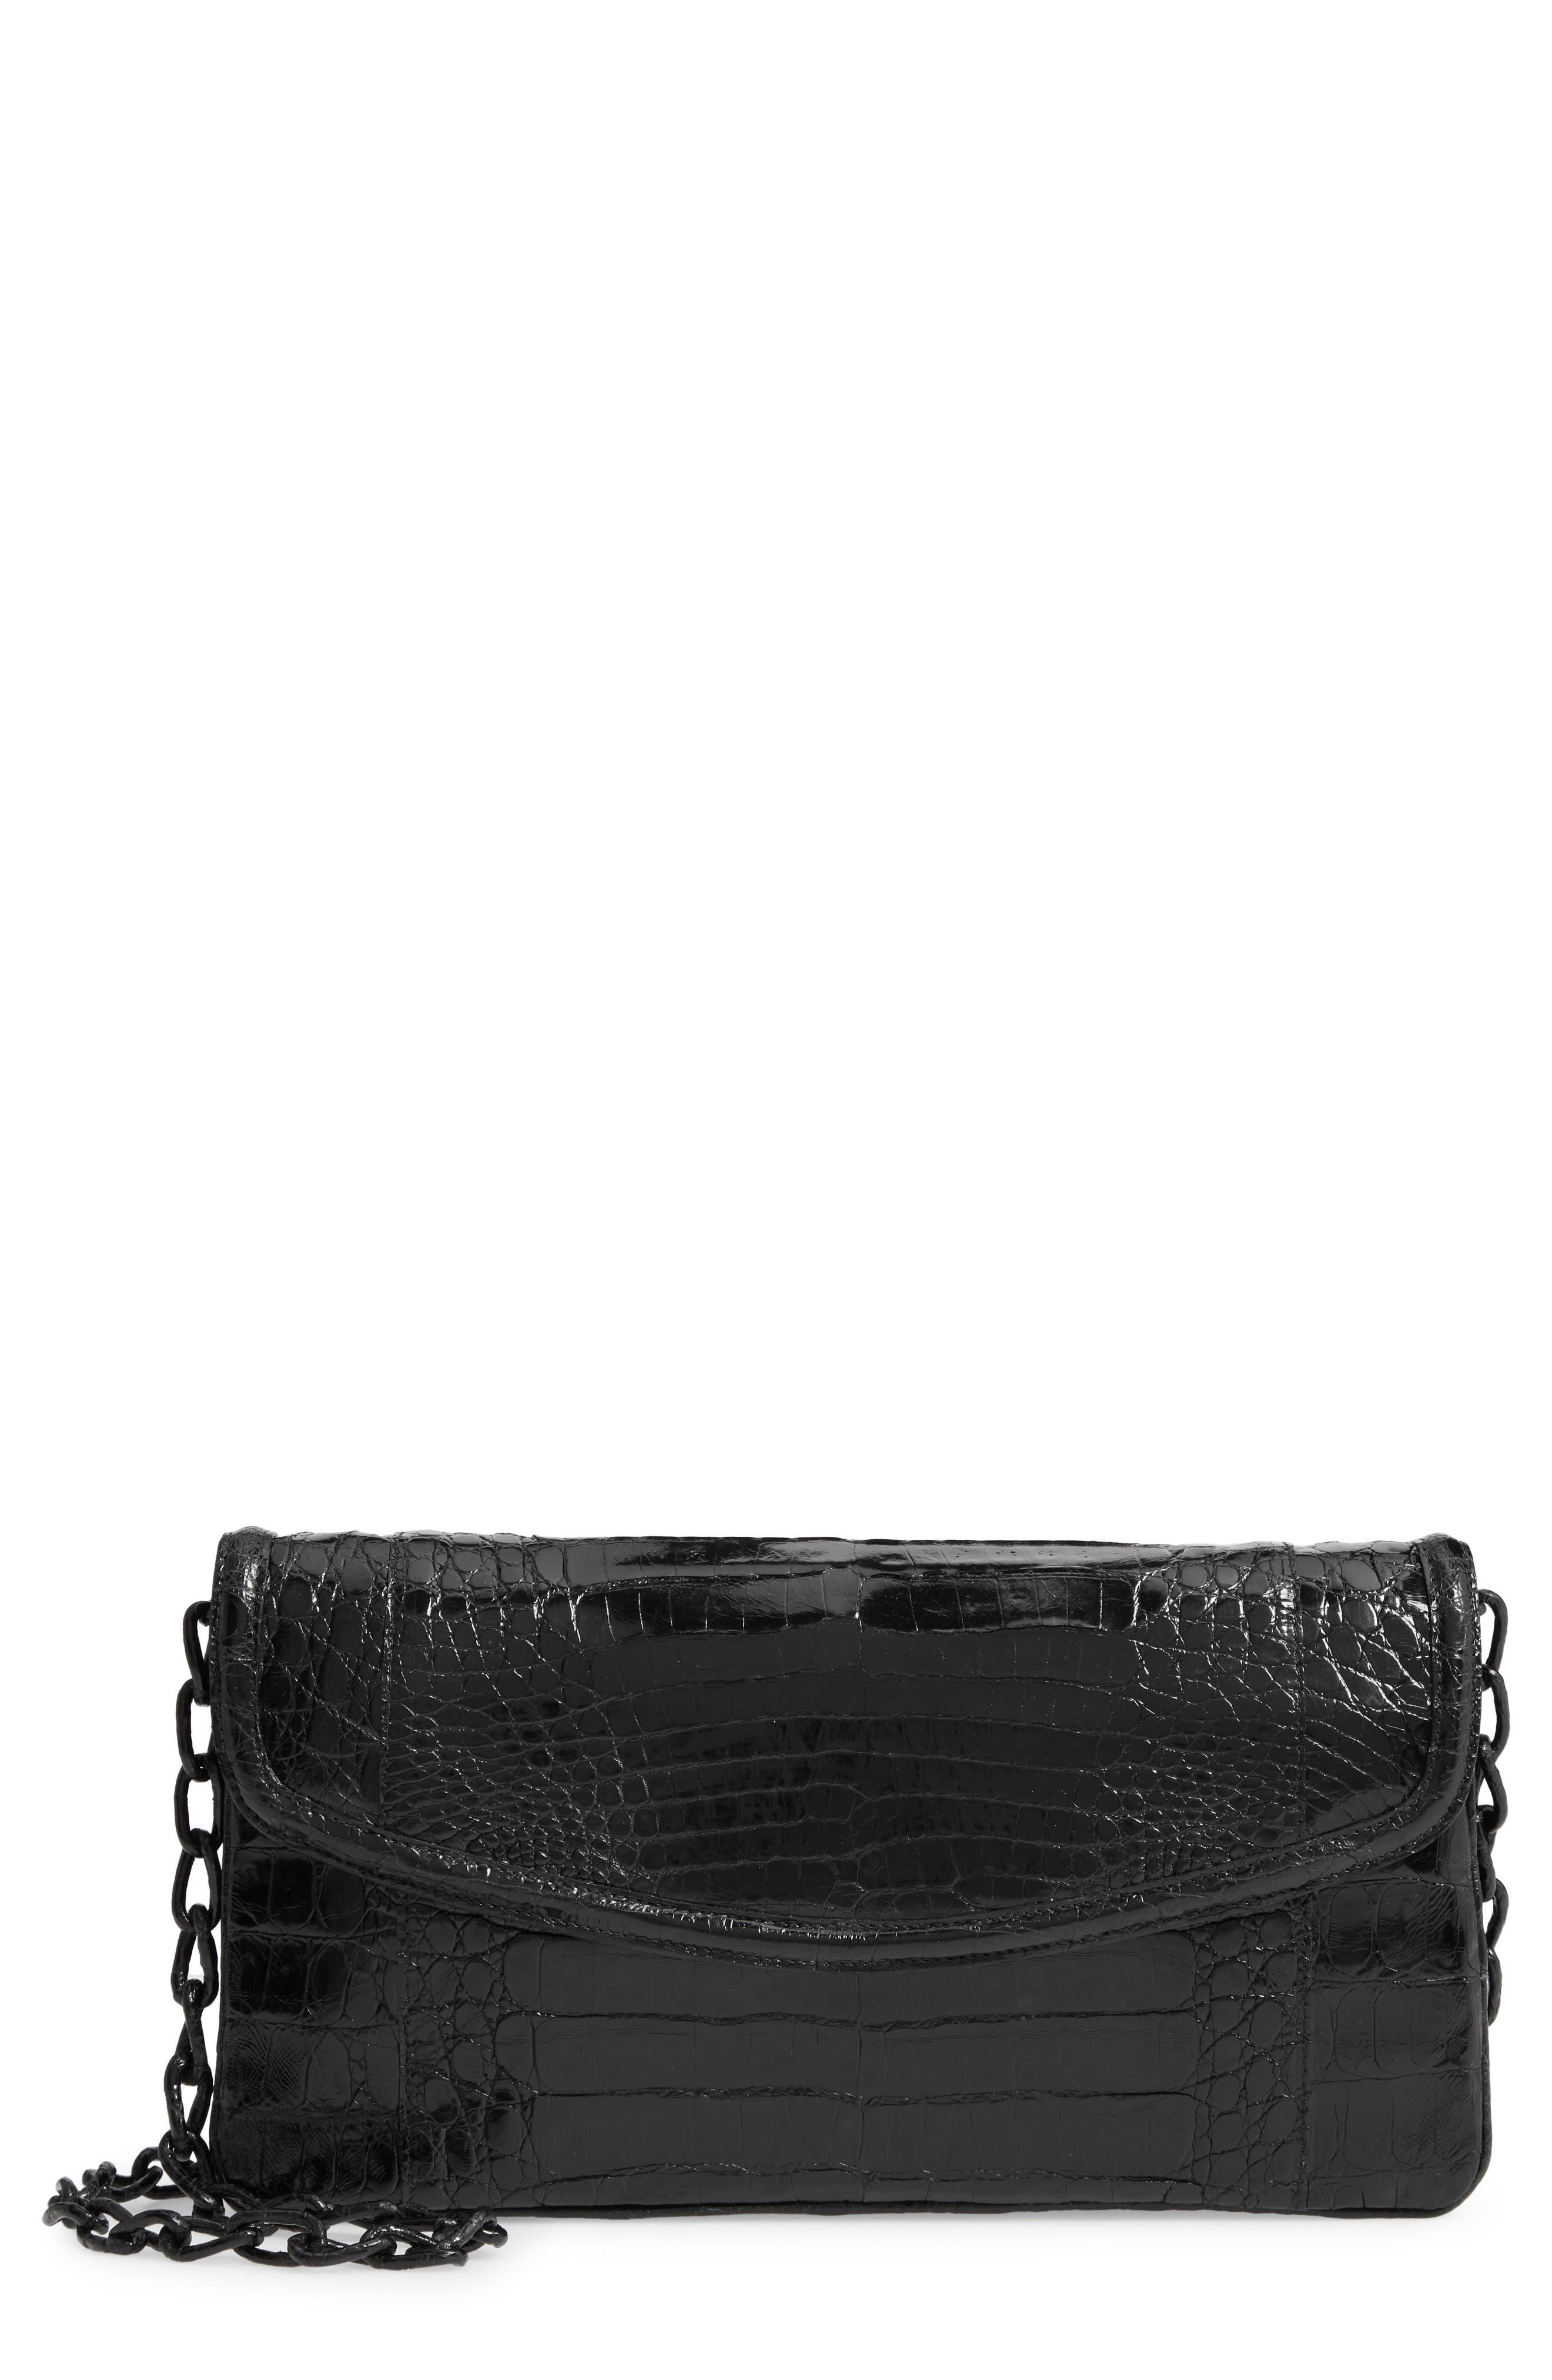 NANCY GONZALEZ Small Genuine Crocodile Flap Clutch, Main, color, BLACK SHINY